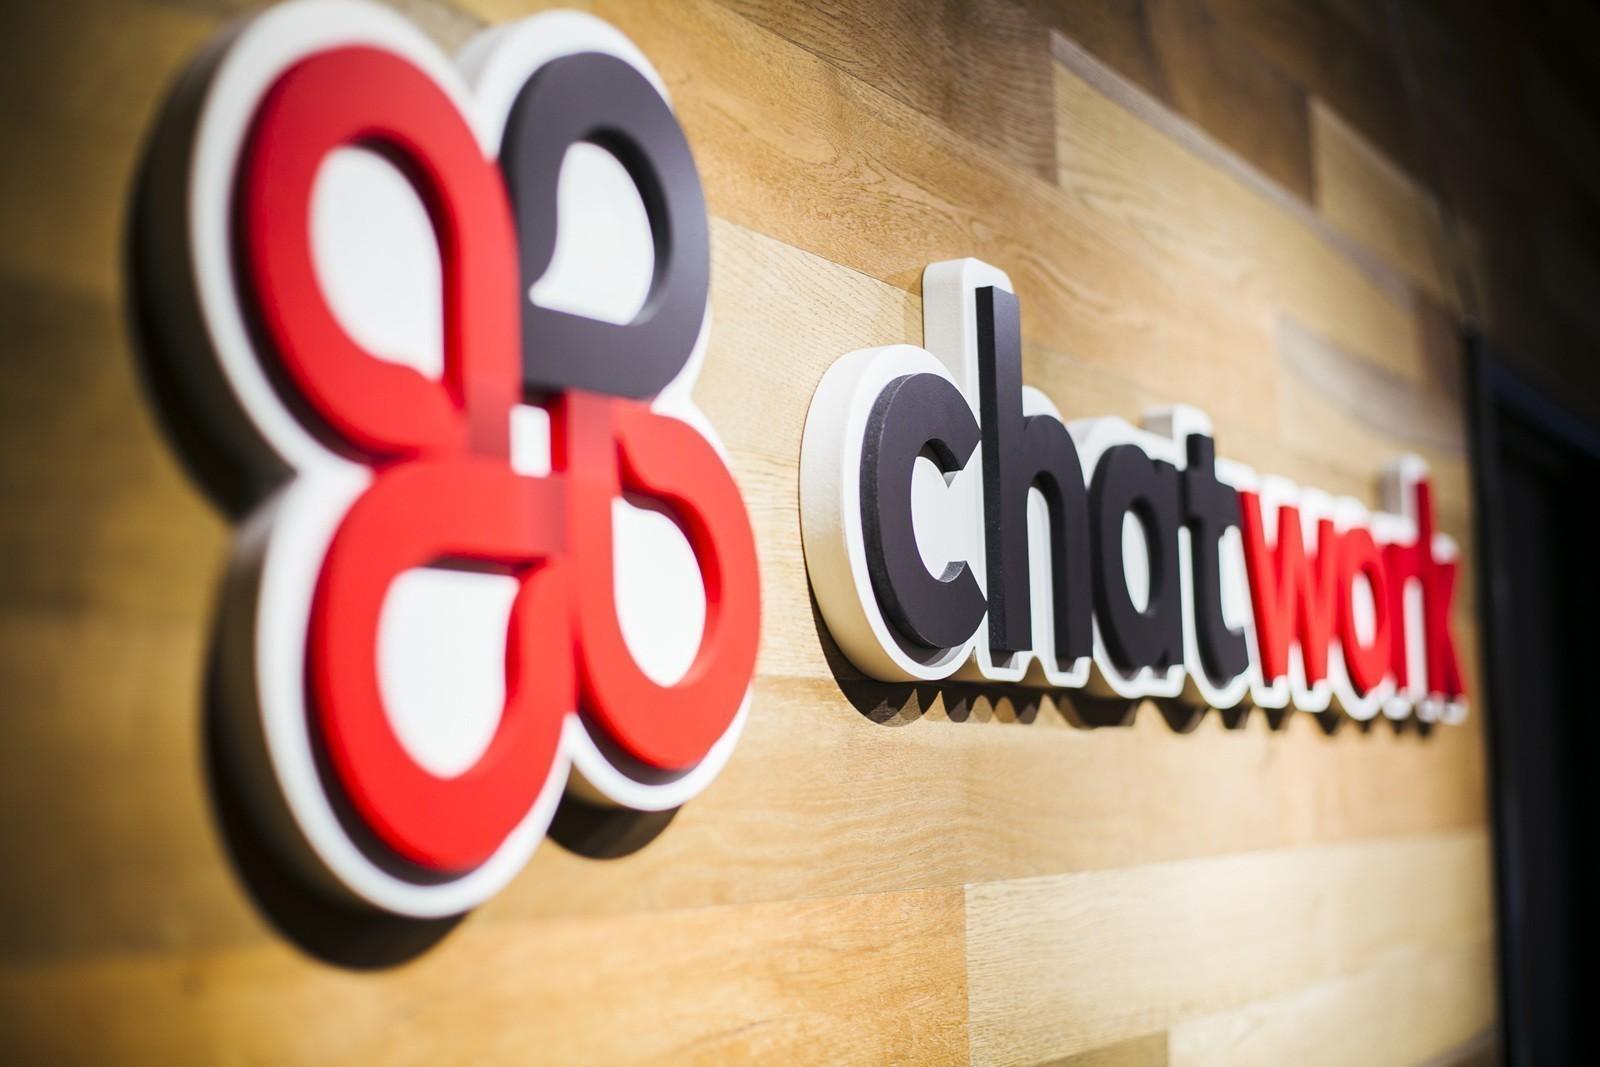 「ChatWork(チャットワーク)」でAndroidエンジニアを募集!!【導入企業数13万社以上】【18億円資金調達完了】